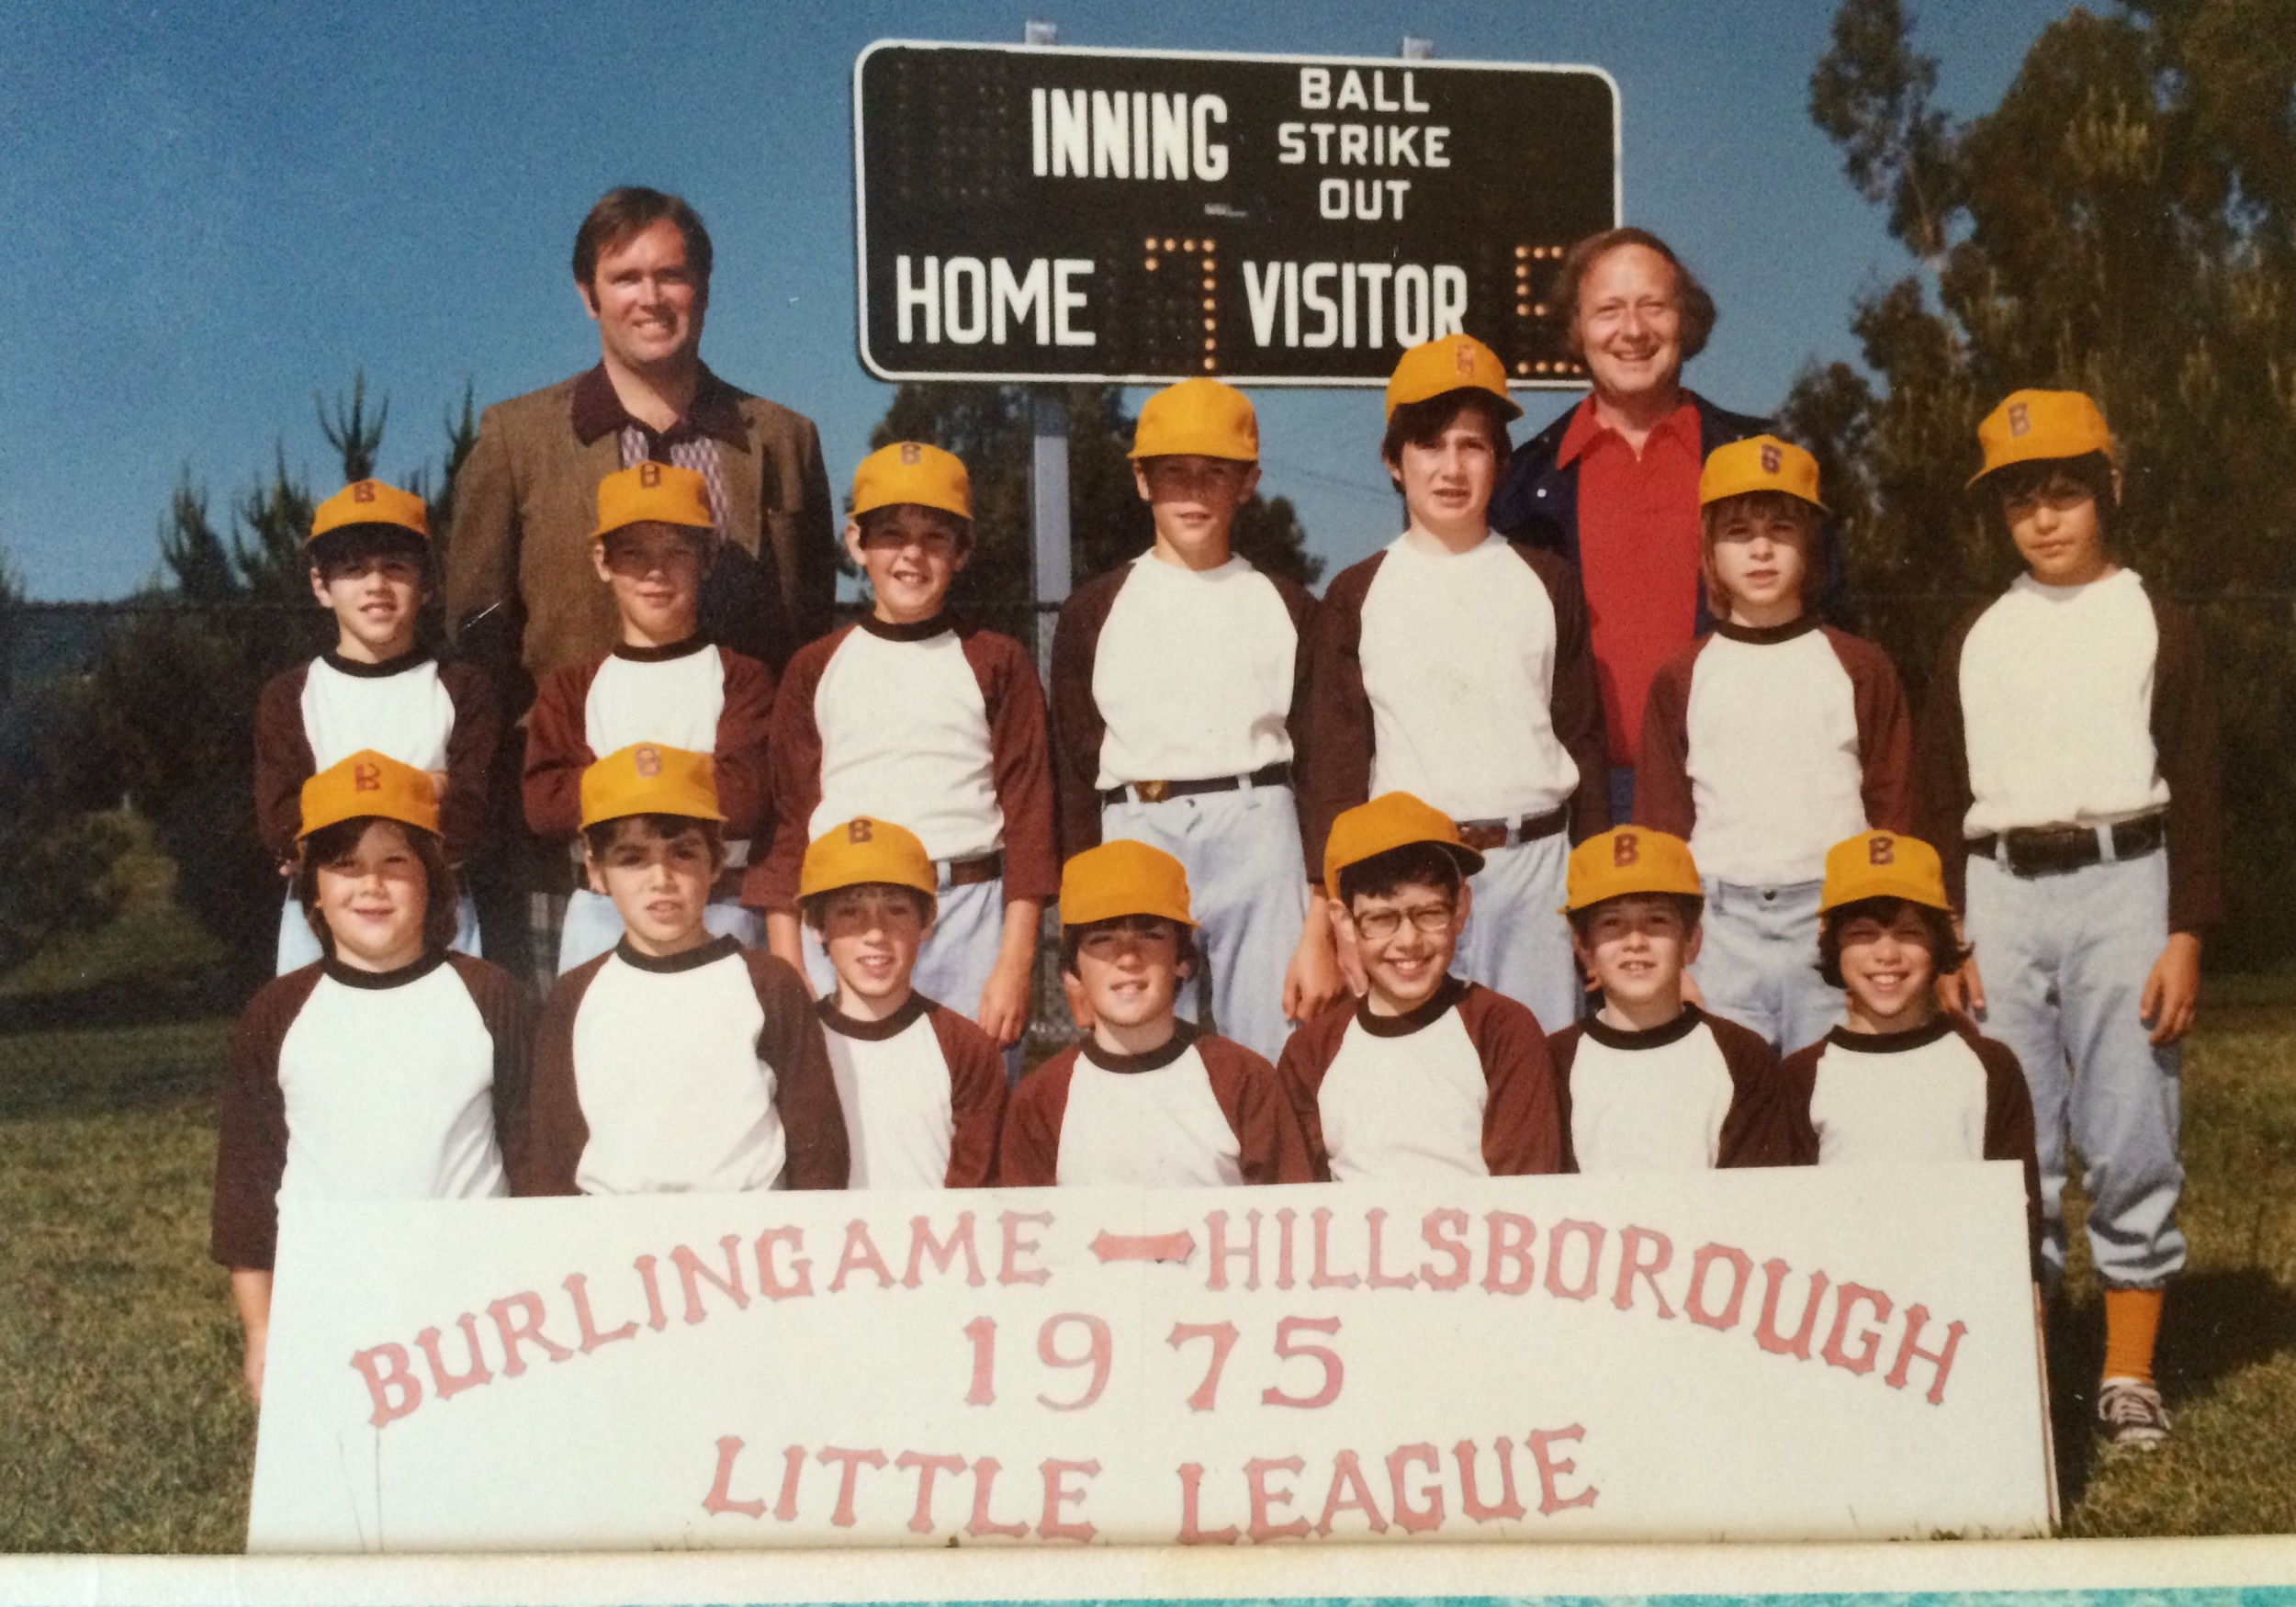 1975 Brown Sox, Burlingame, CA